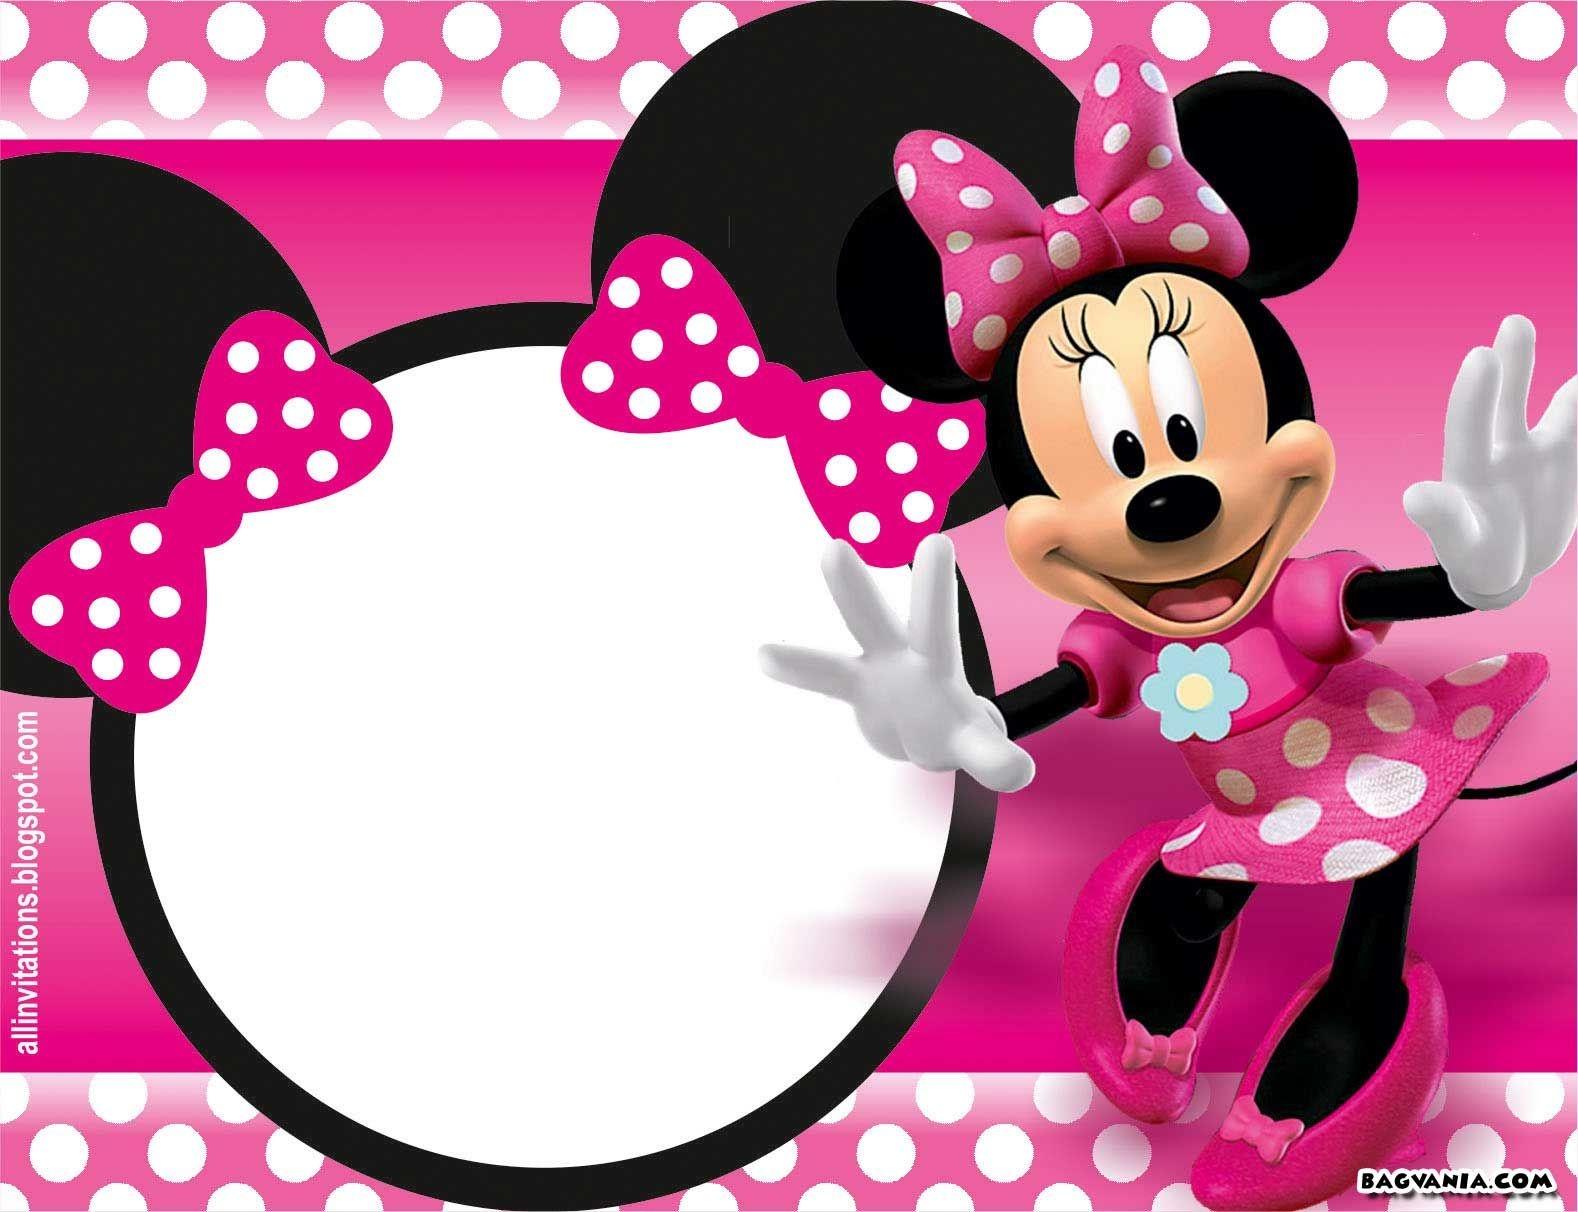 Free Printable Minnie Mouse Birthday Invitations – Bagvania Free - Free Minnie Mouse Printable Templates